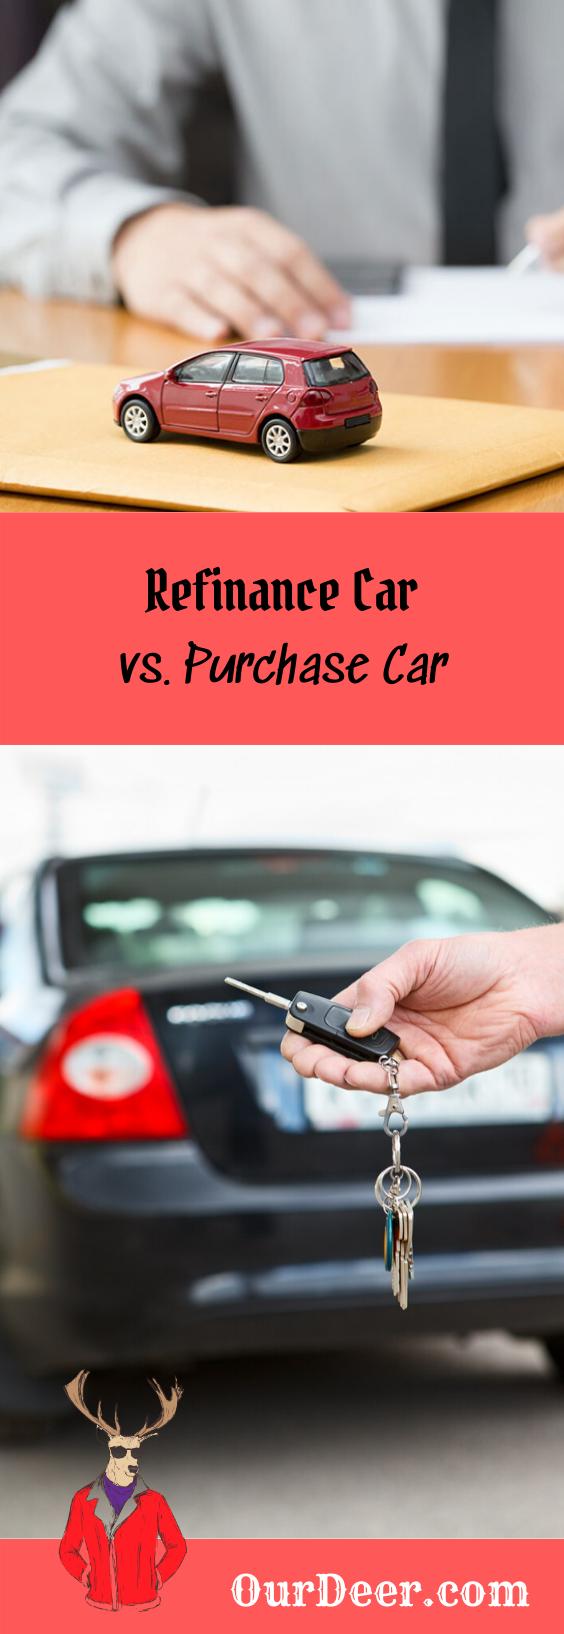 Refinance Car Vs Purchase Car Refinance Car Car Car Purchase